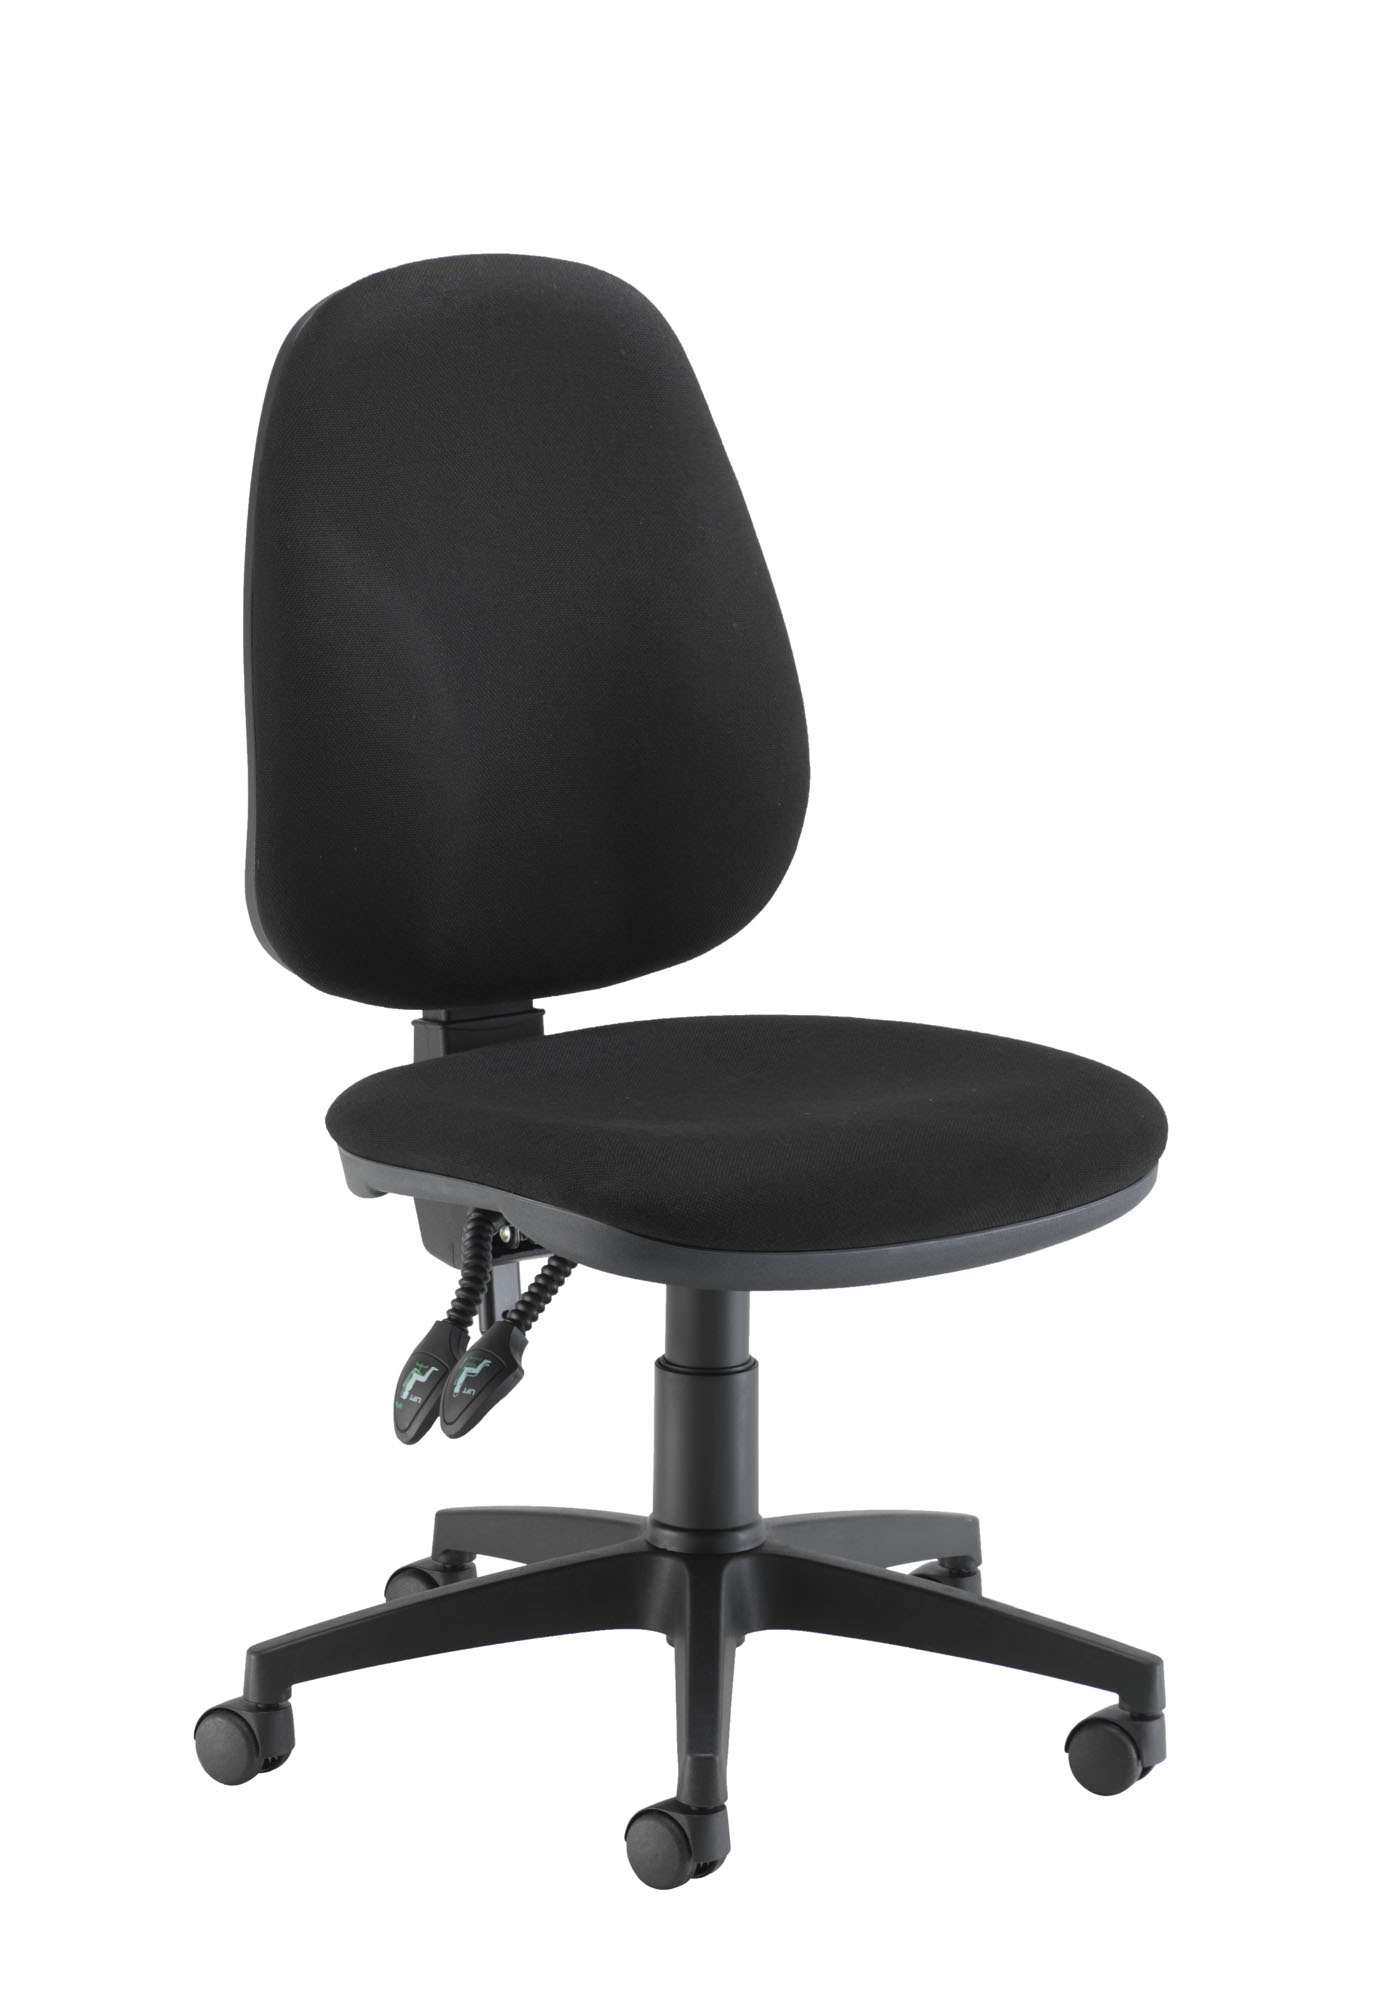 Calypso High Back Office Chair